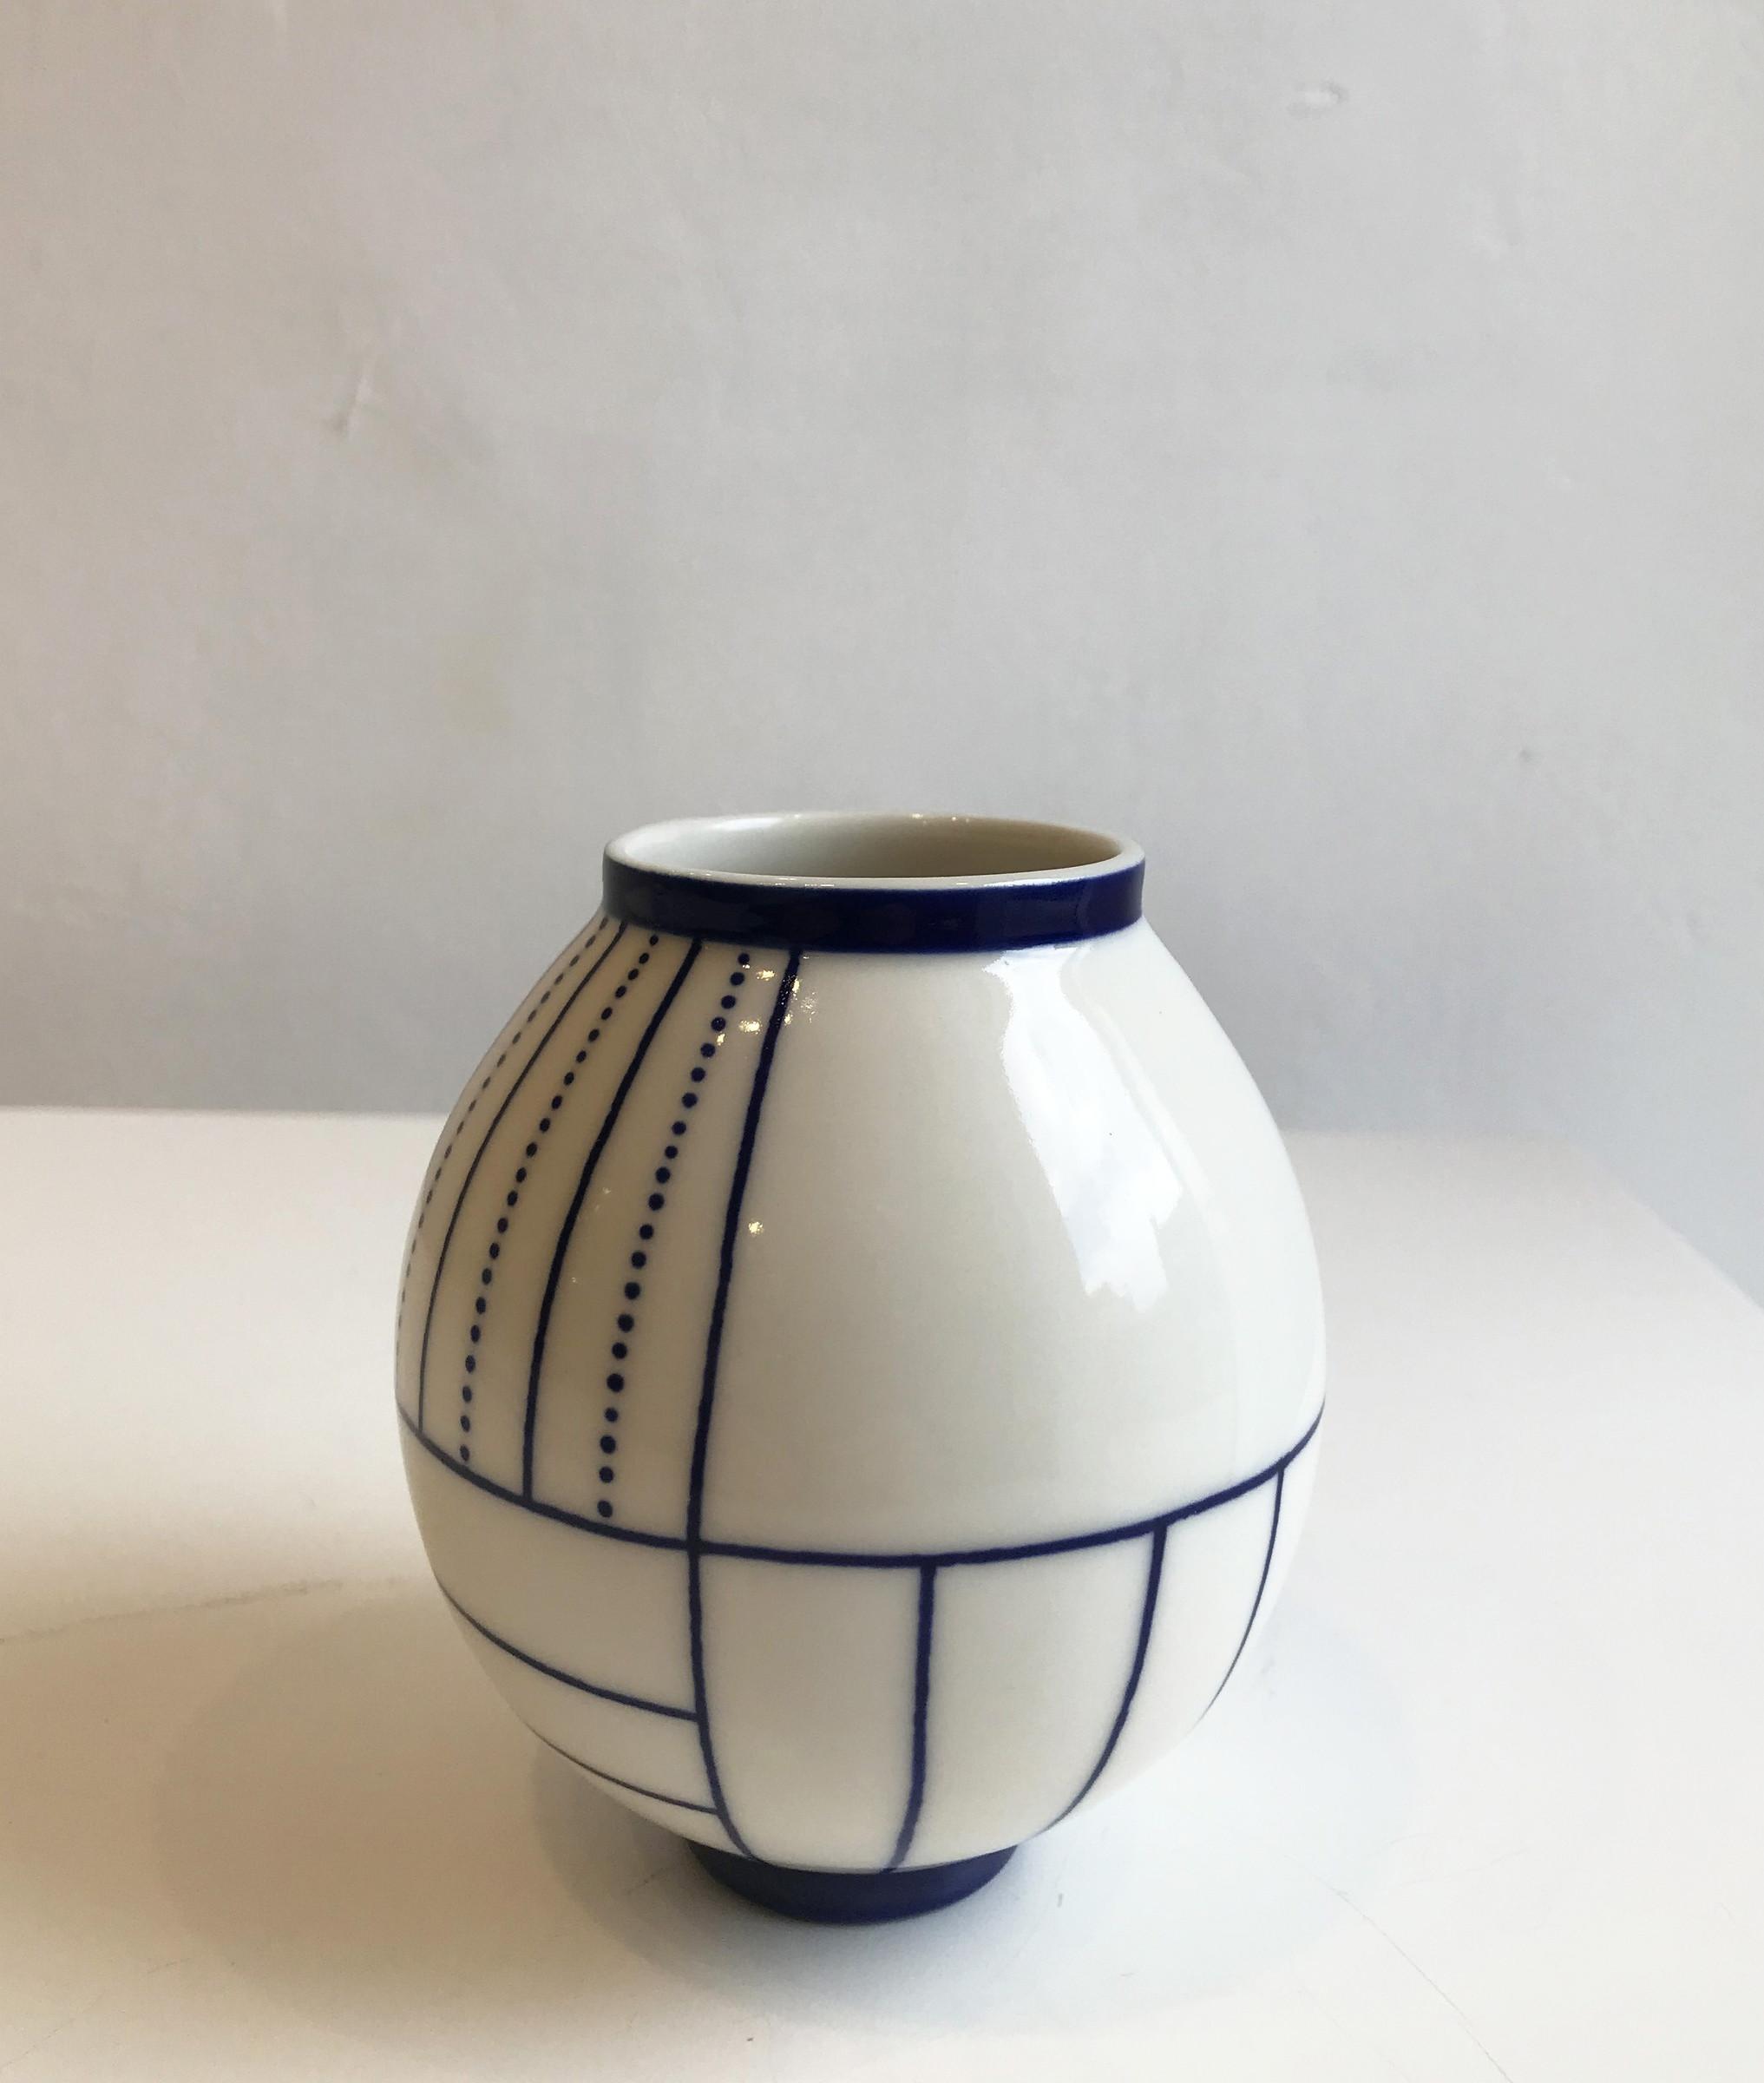 metal urn vase of geometric moon jar small sarah wiseman gallery with geometric moon jar small